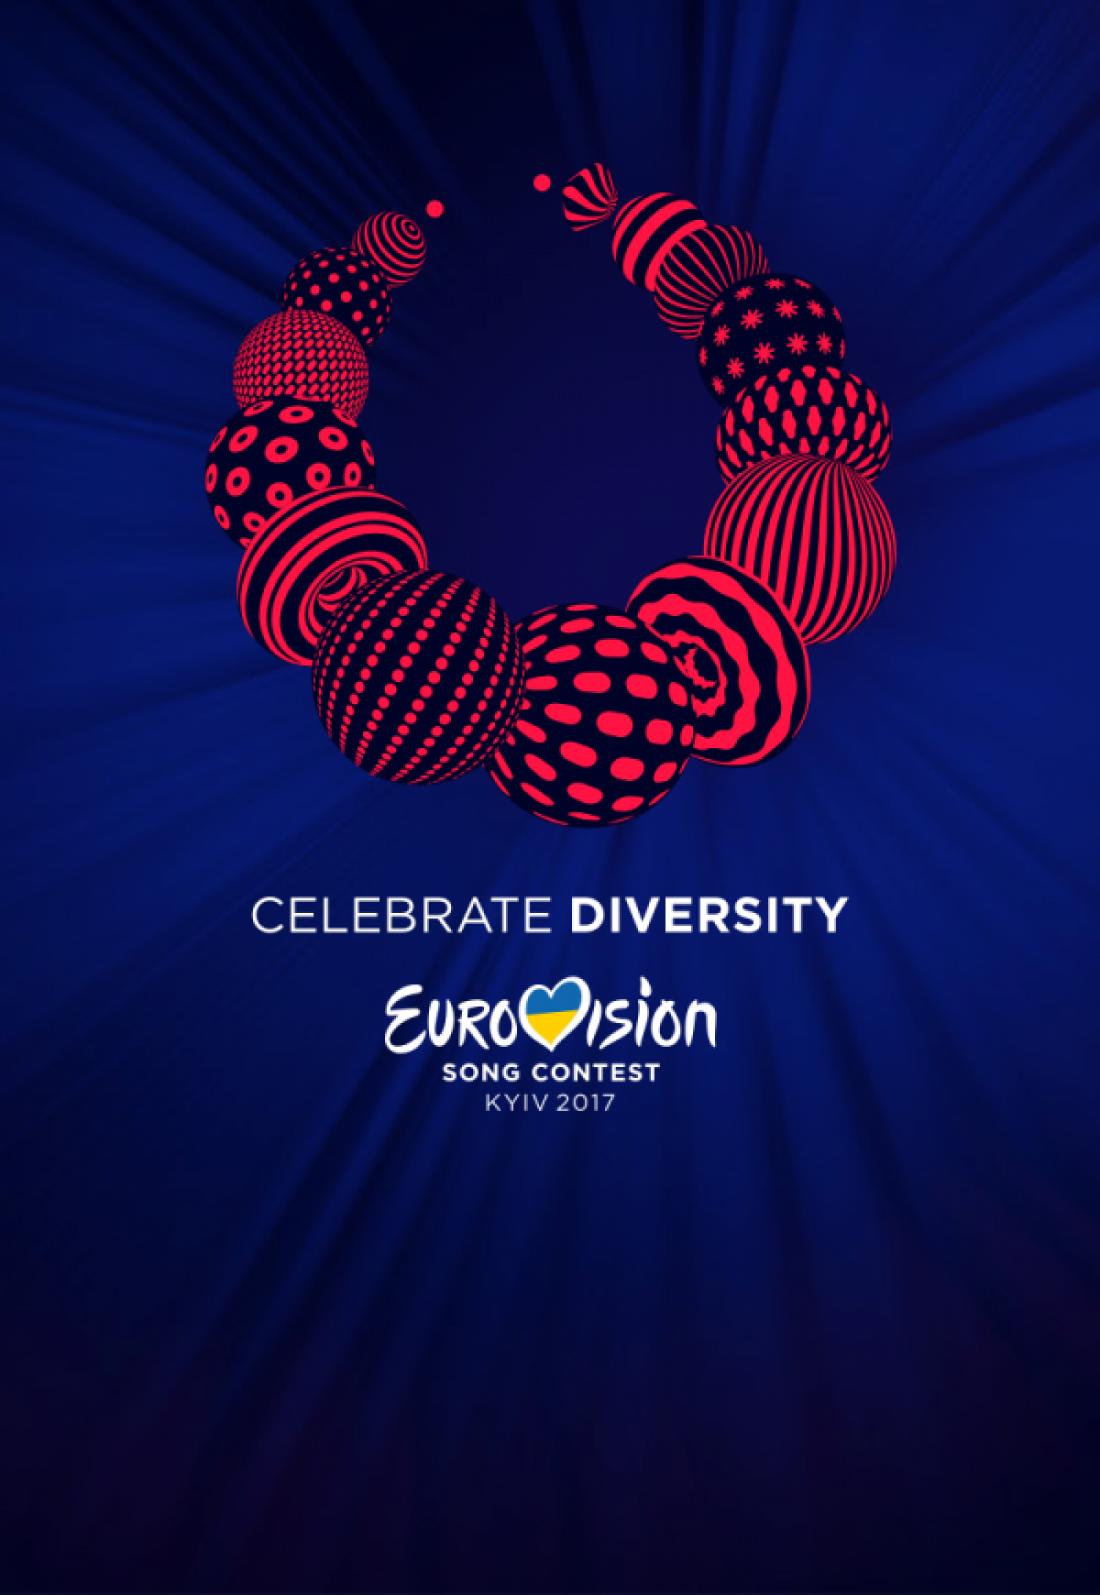 Евровидение 2017: логотип конкурса